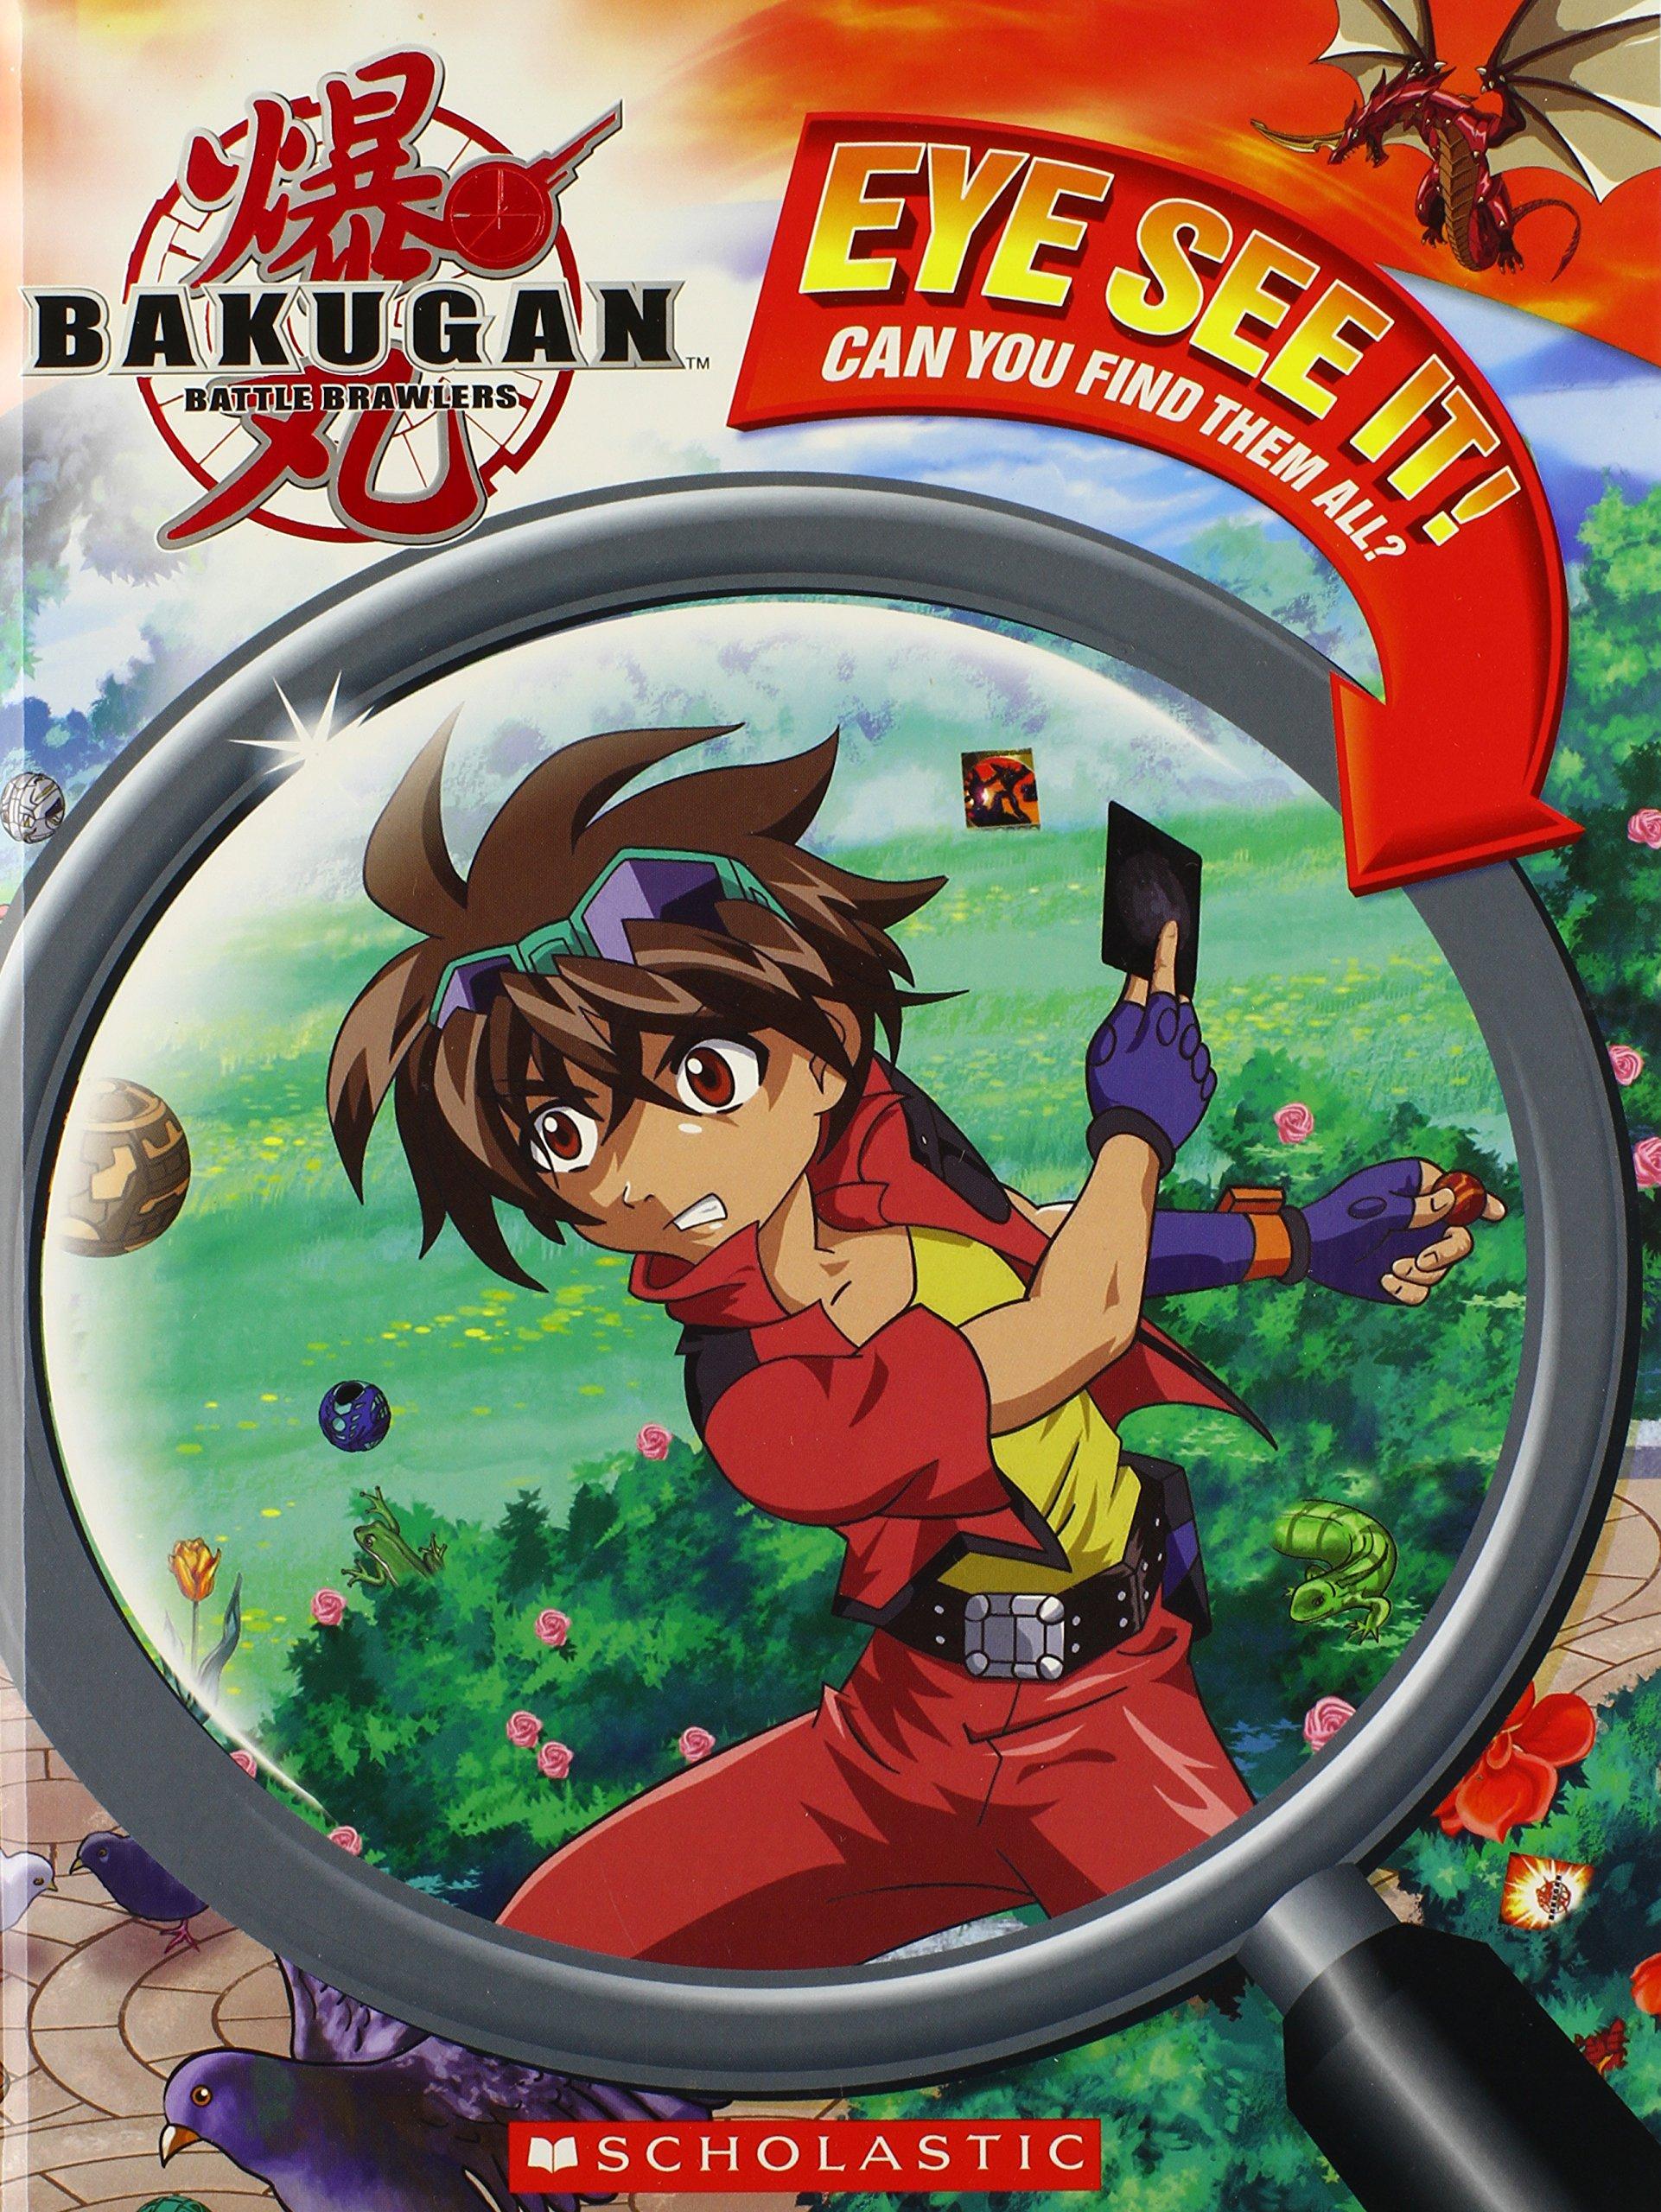 Eye See It! (Bakugan Battle Brawlers)   Bakugan Wiki